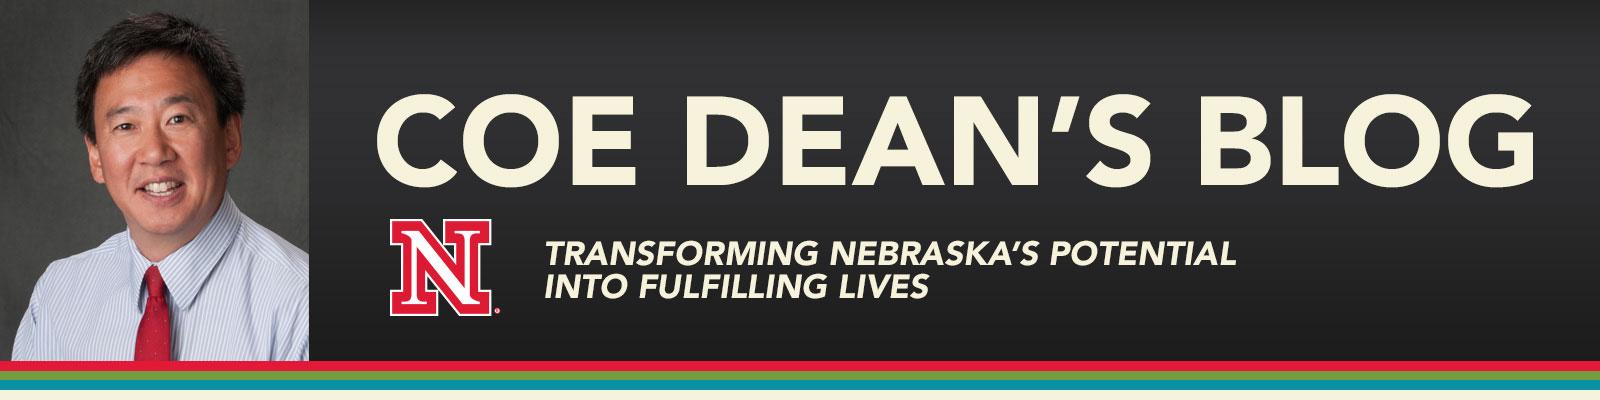 COE Dean's Blog - Transforming Nebraska's Potential into fulfilling lives